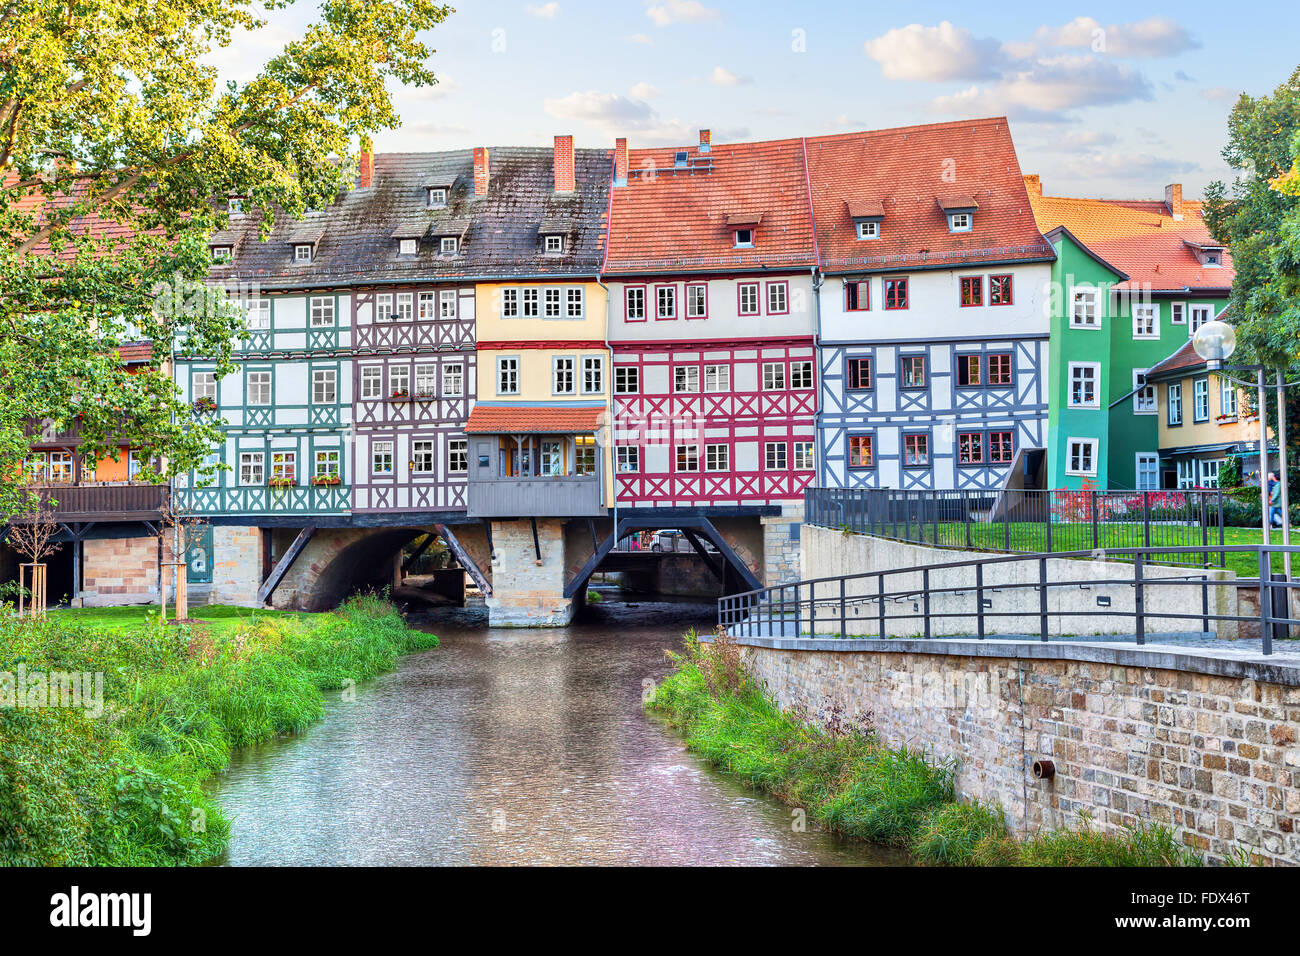 Bridge Kramerbrucke in Erfurt, Thuringia, Germany - Stock Image